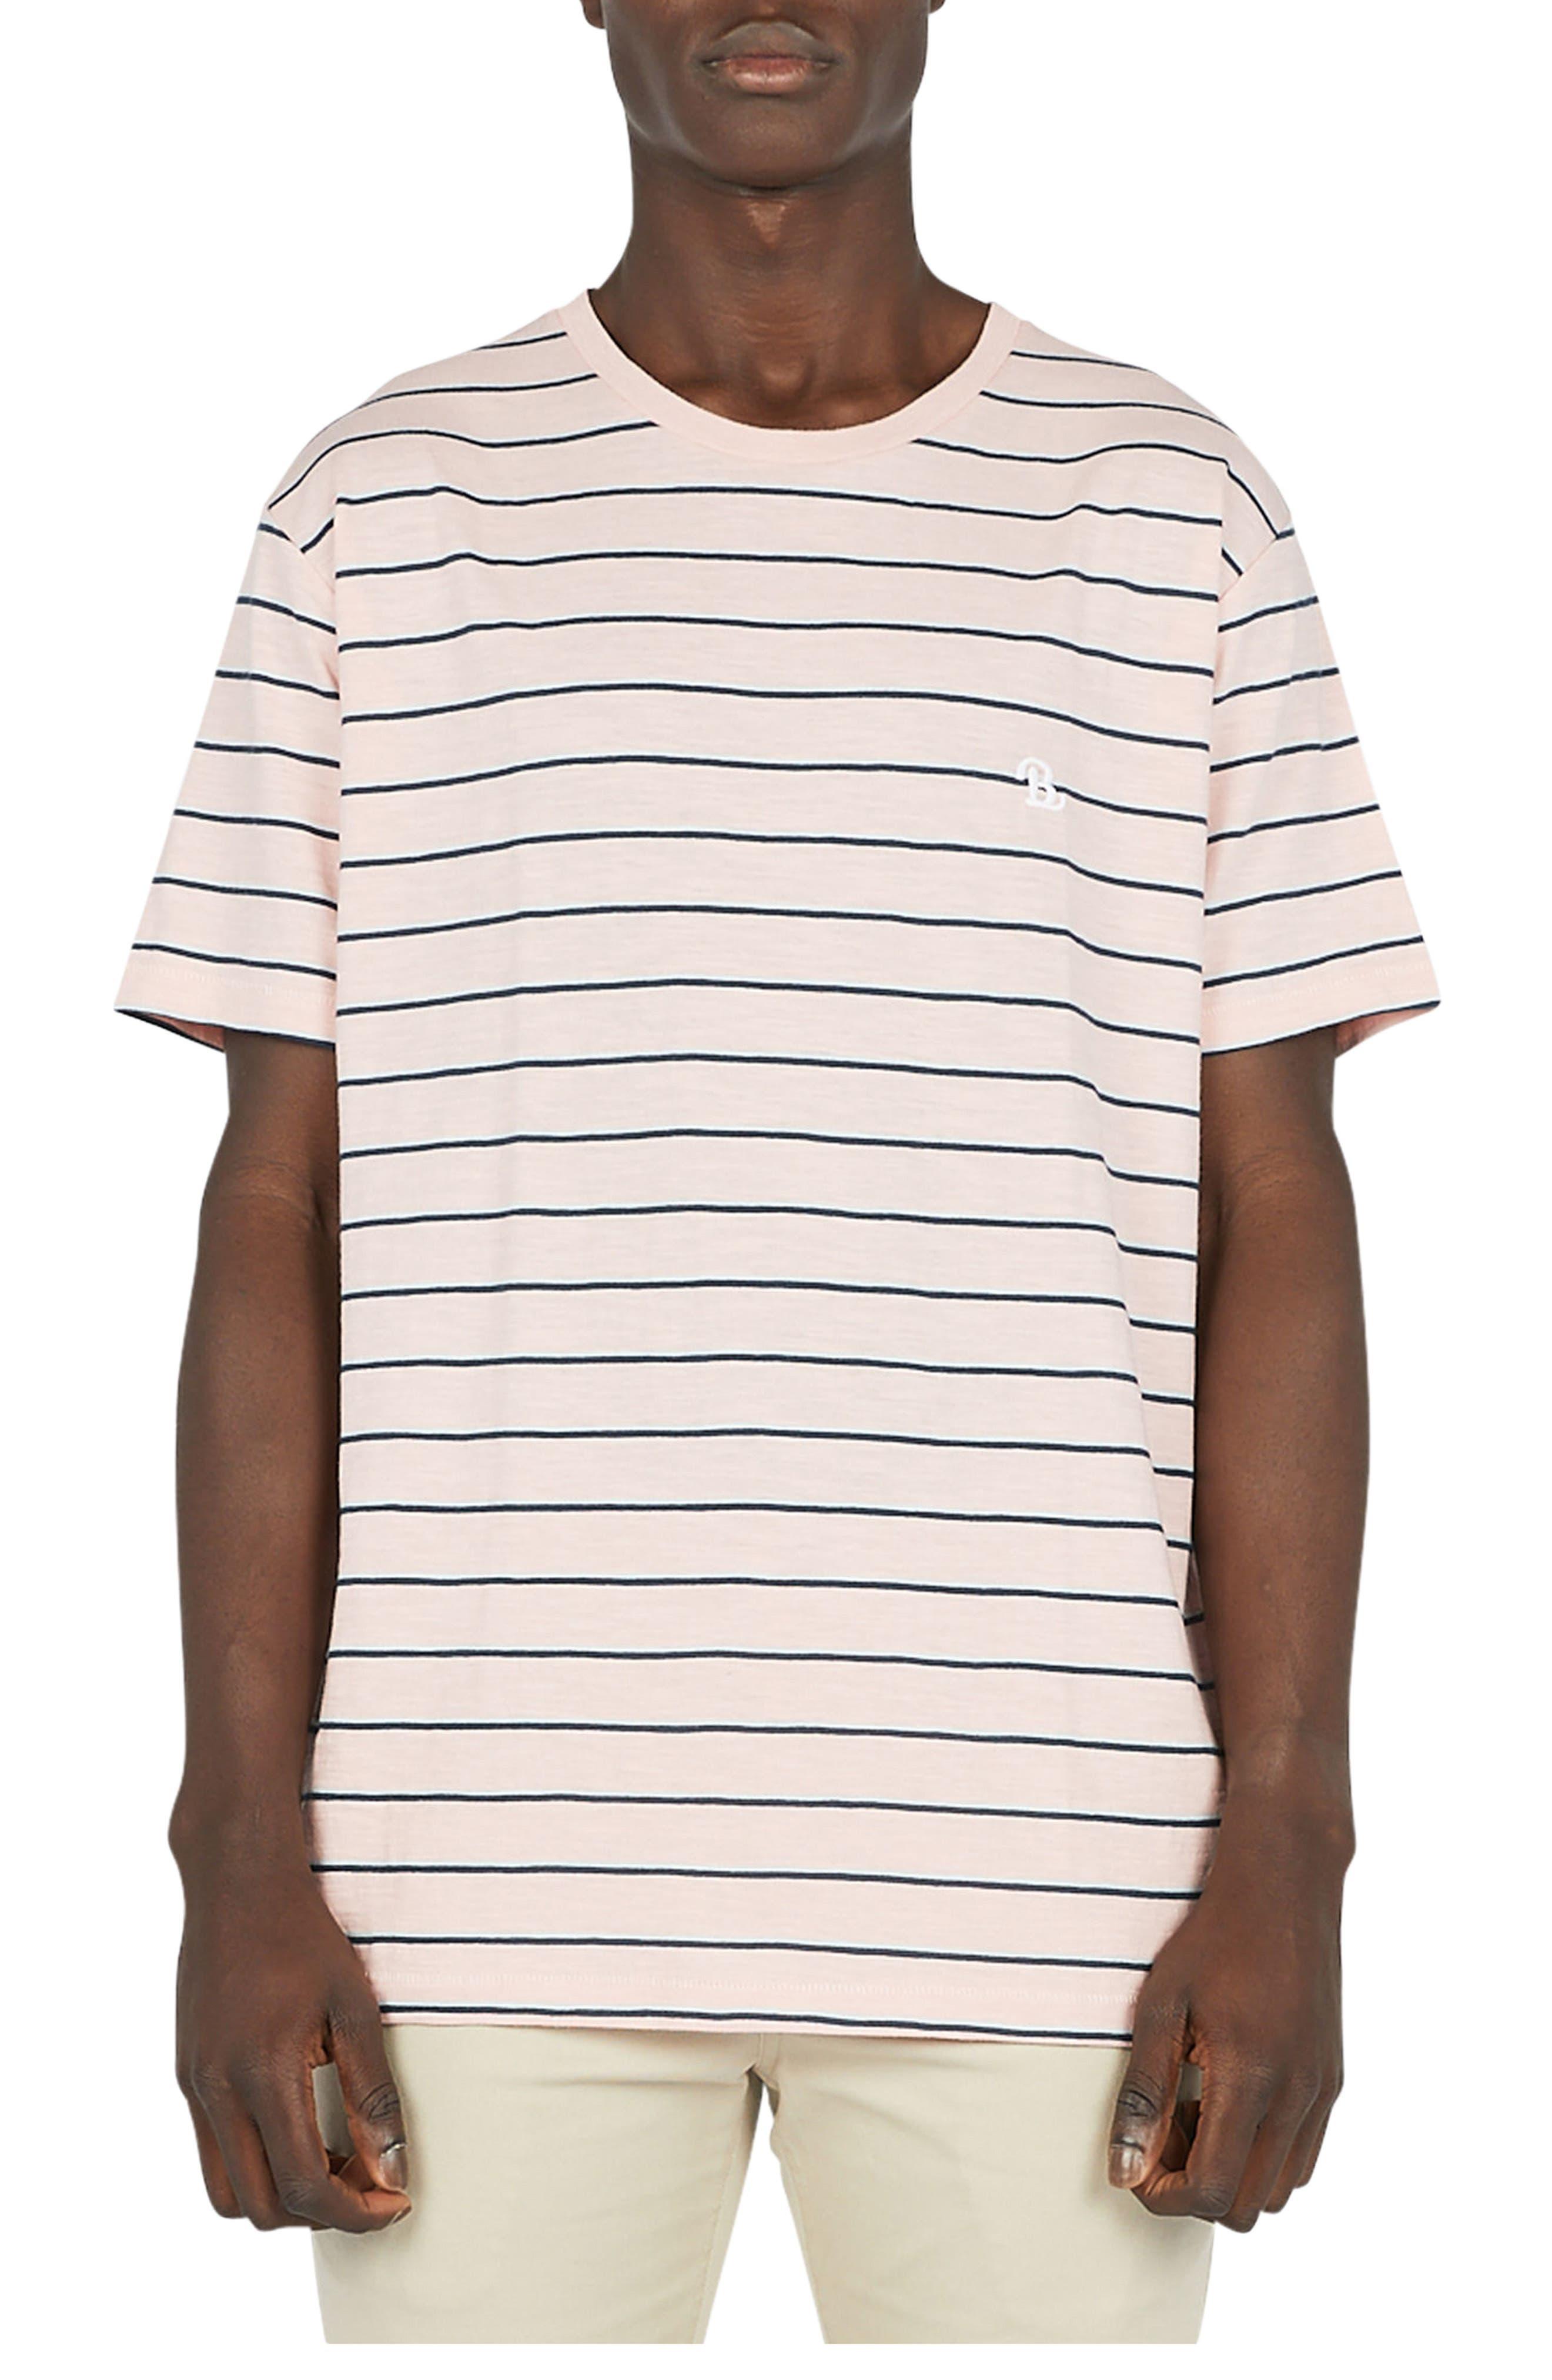 B.Schooled T-Shirt,                         Main,                         color, Pink Stripe